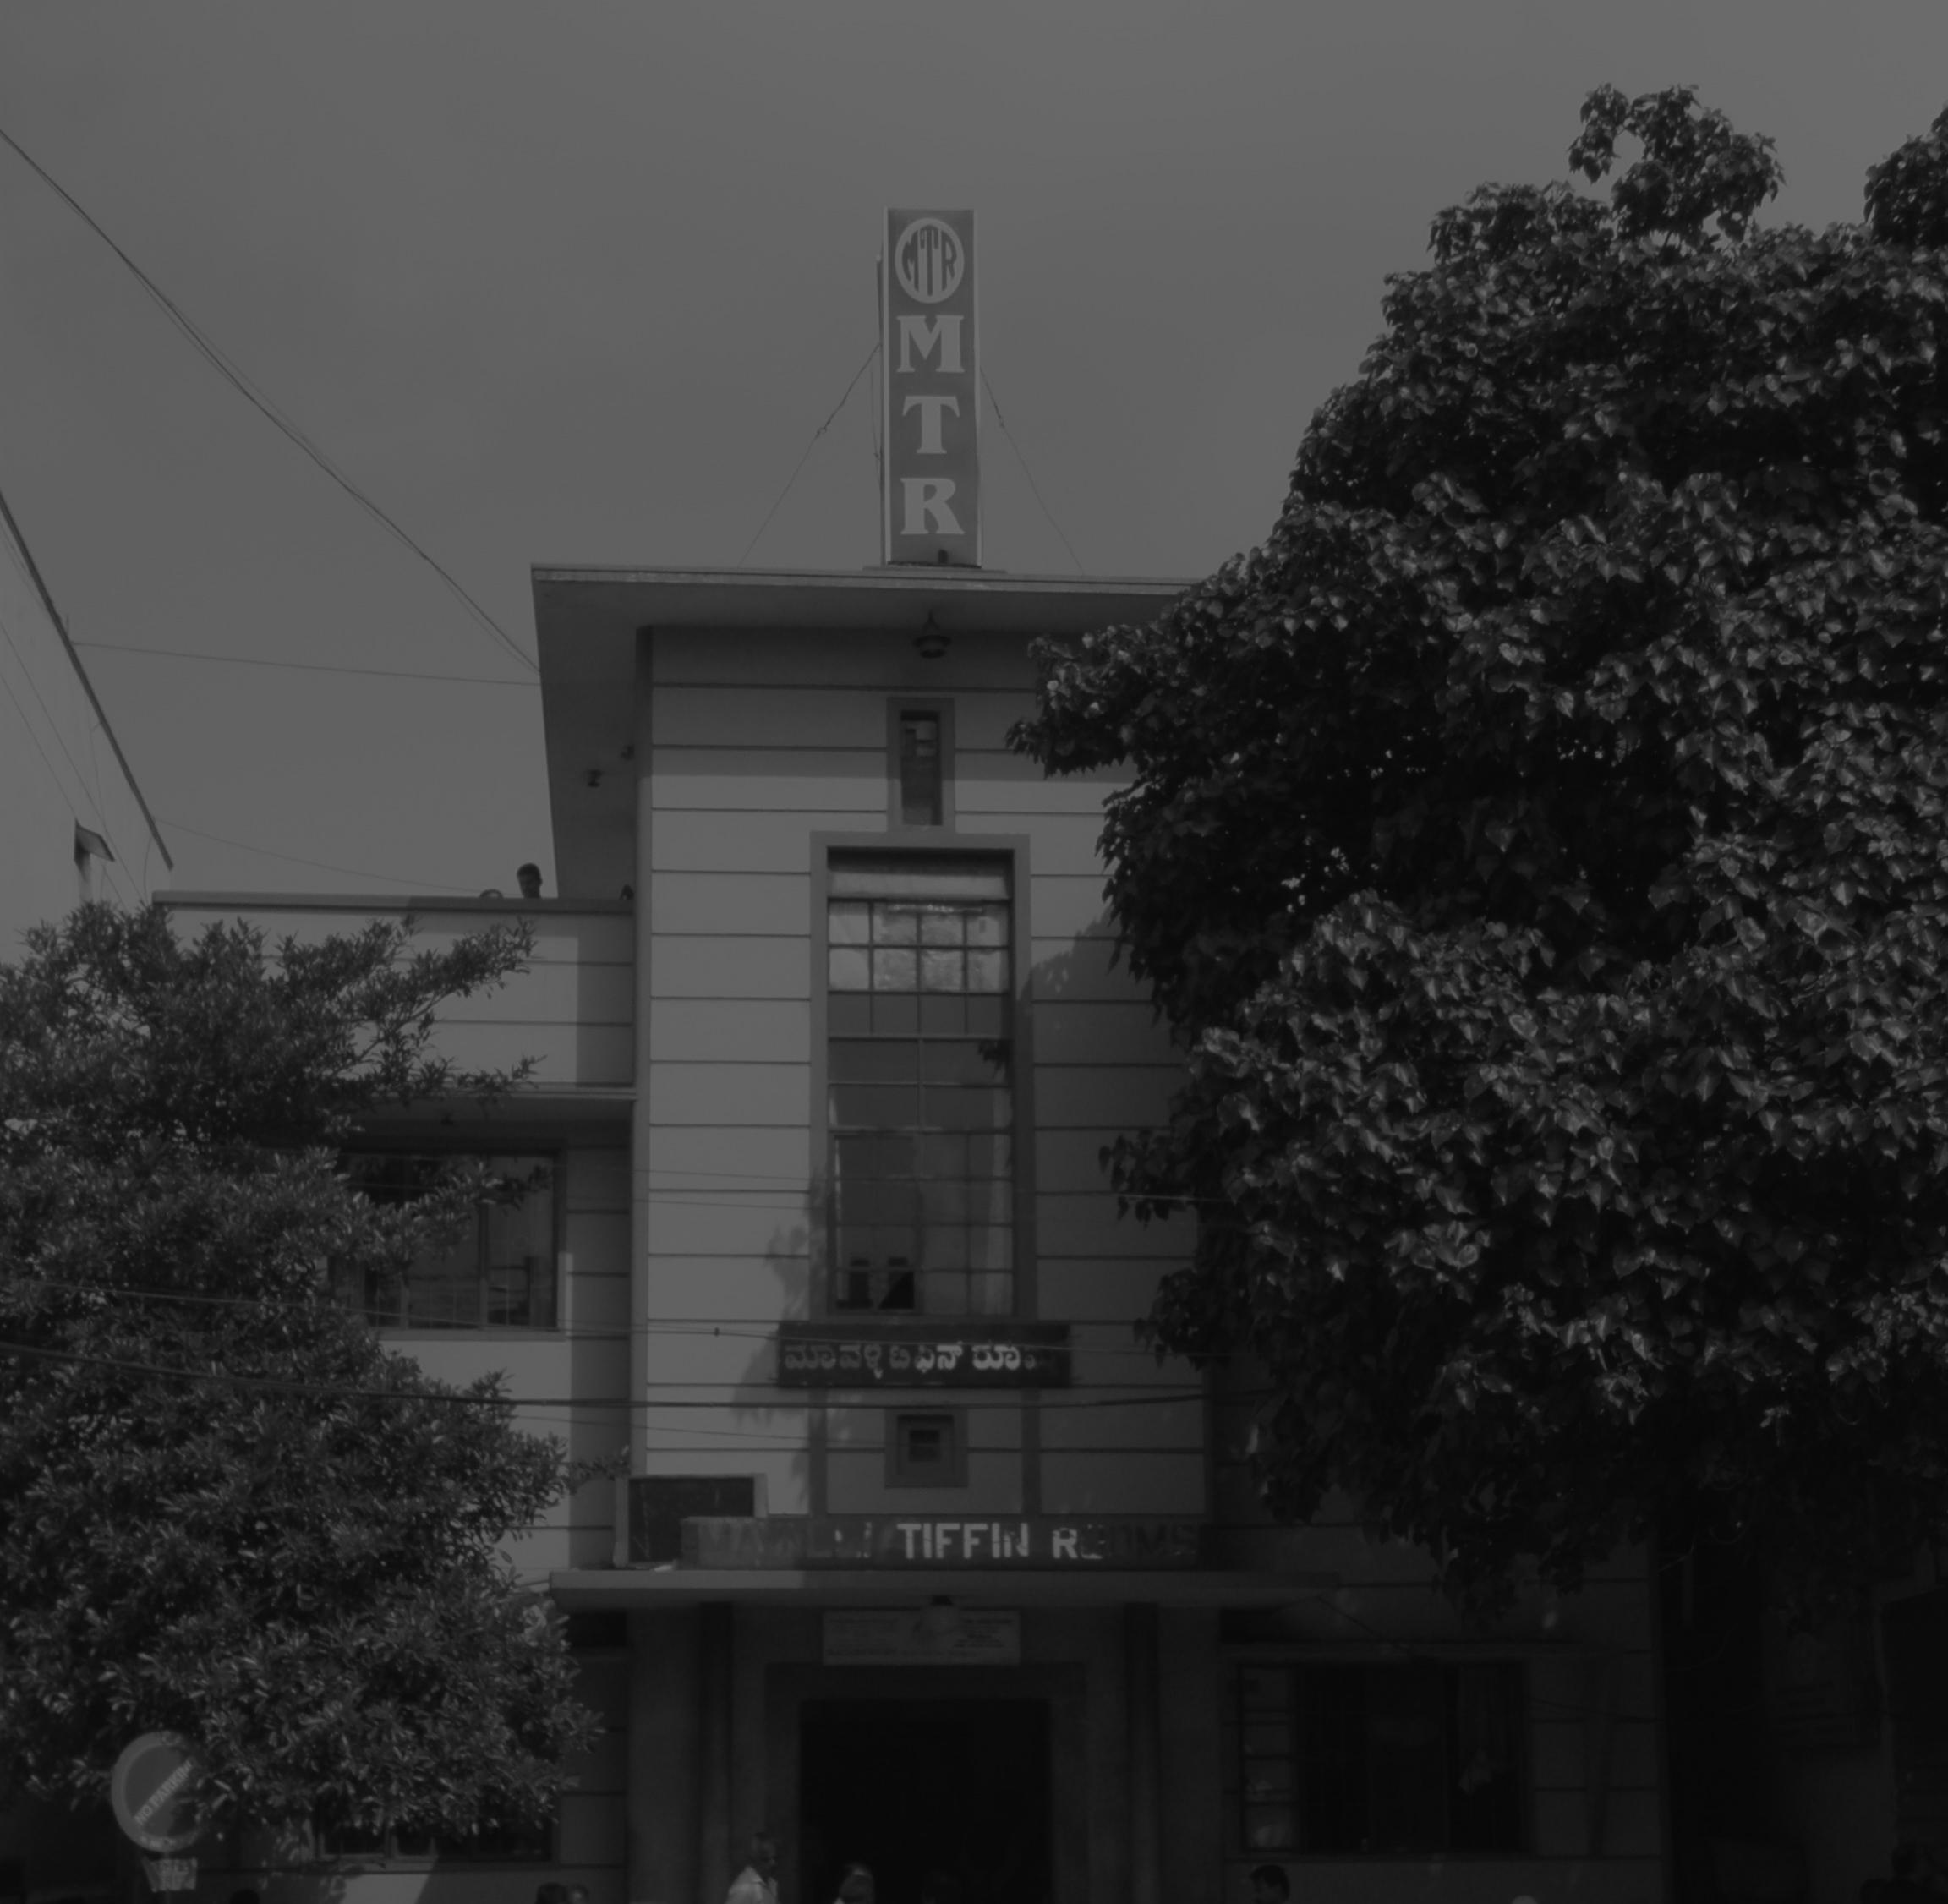 MTR | Mavalli Tiffin Rooms